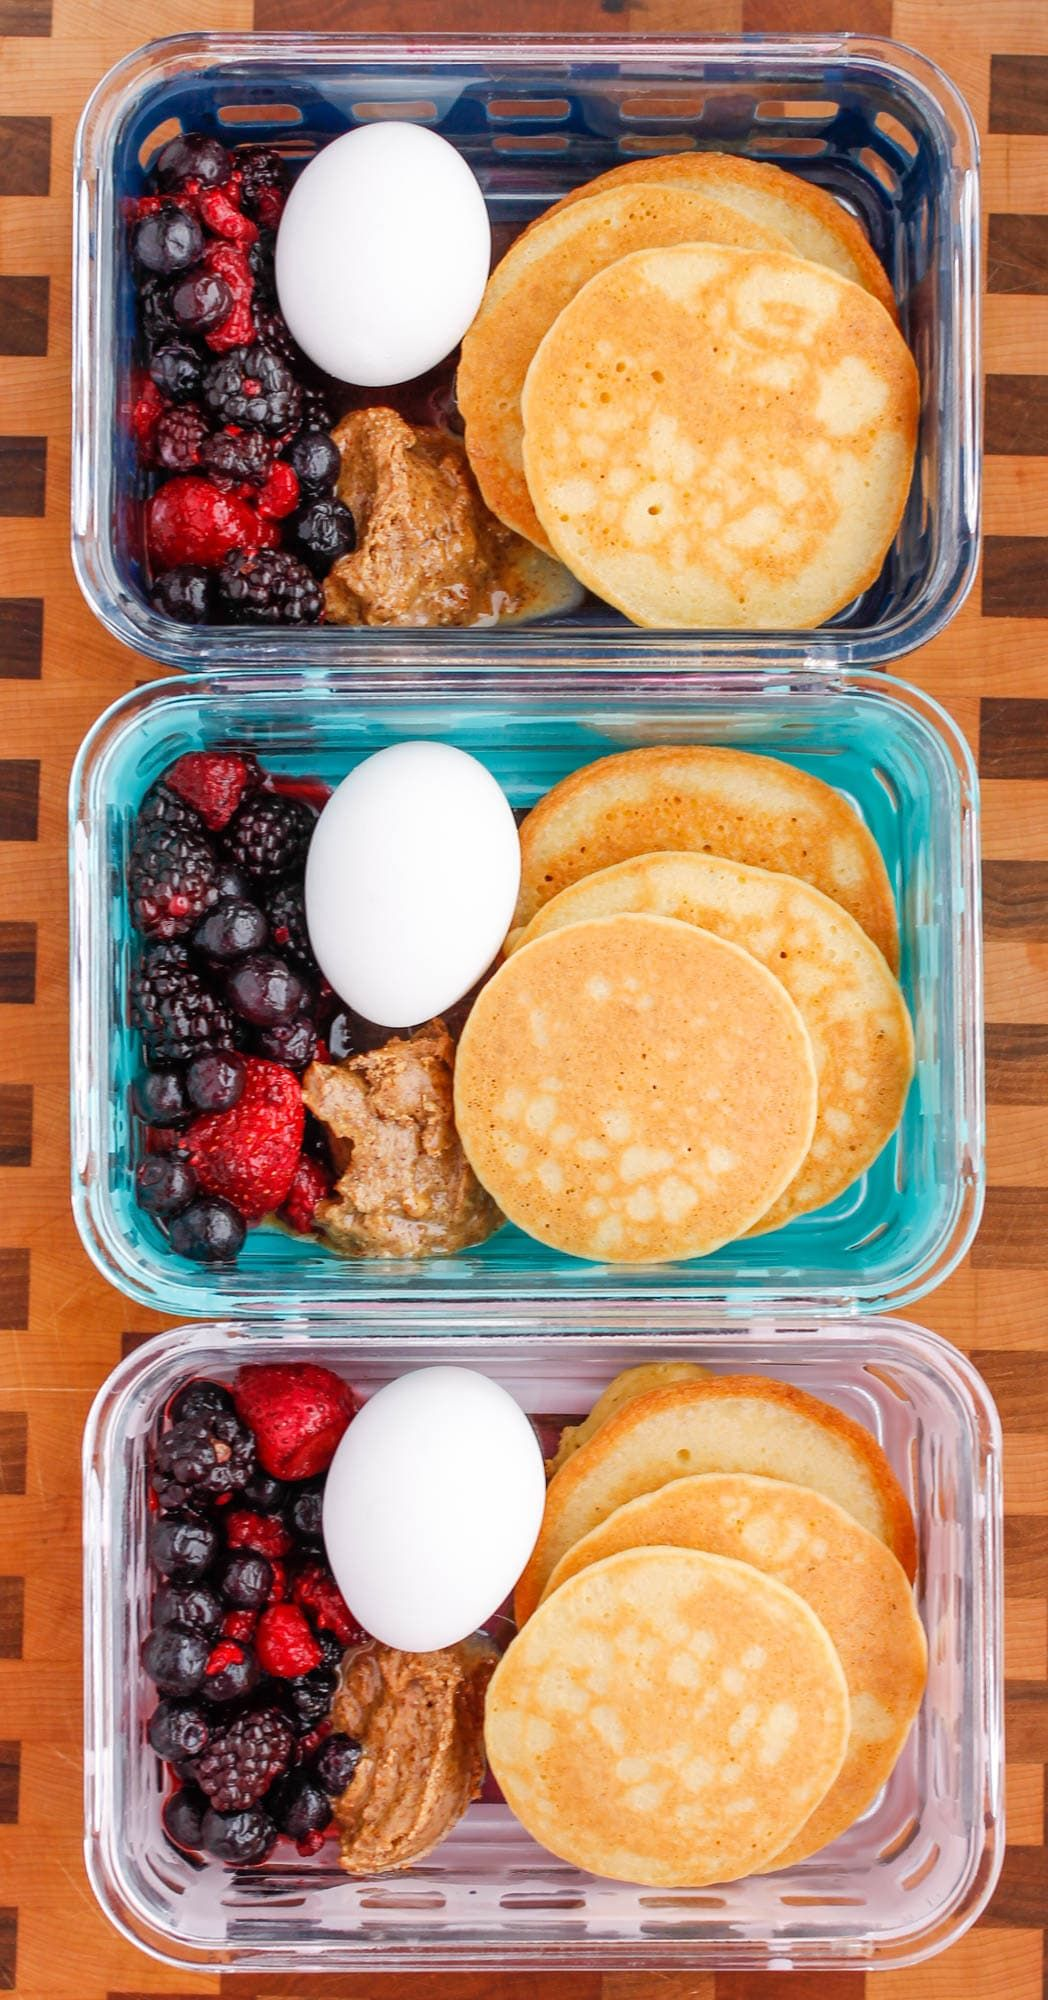 Paleo Pancake Breakfast Meal Prep Bowls – Smile Sandwich